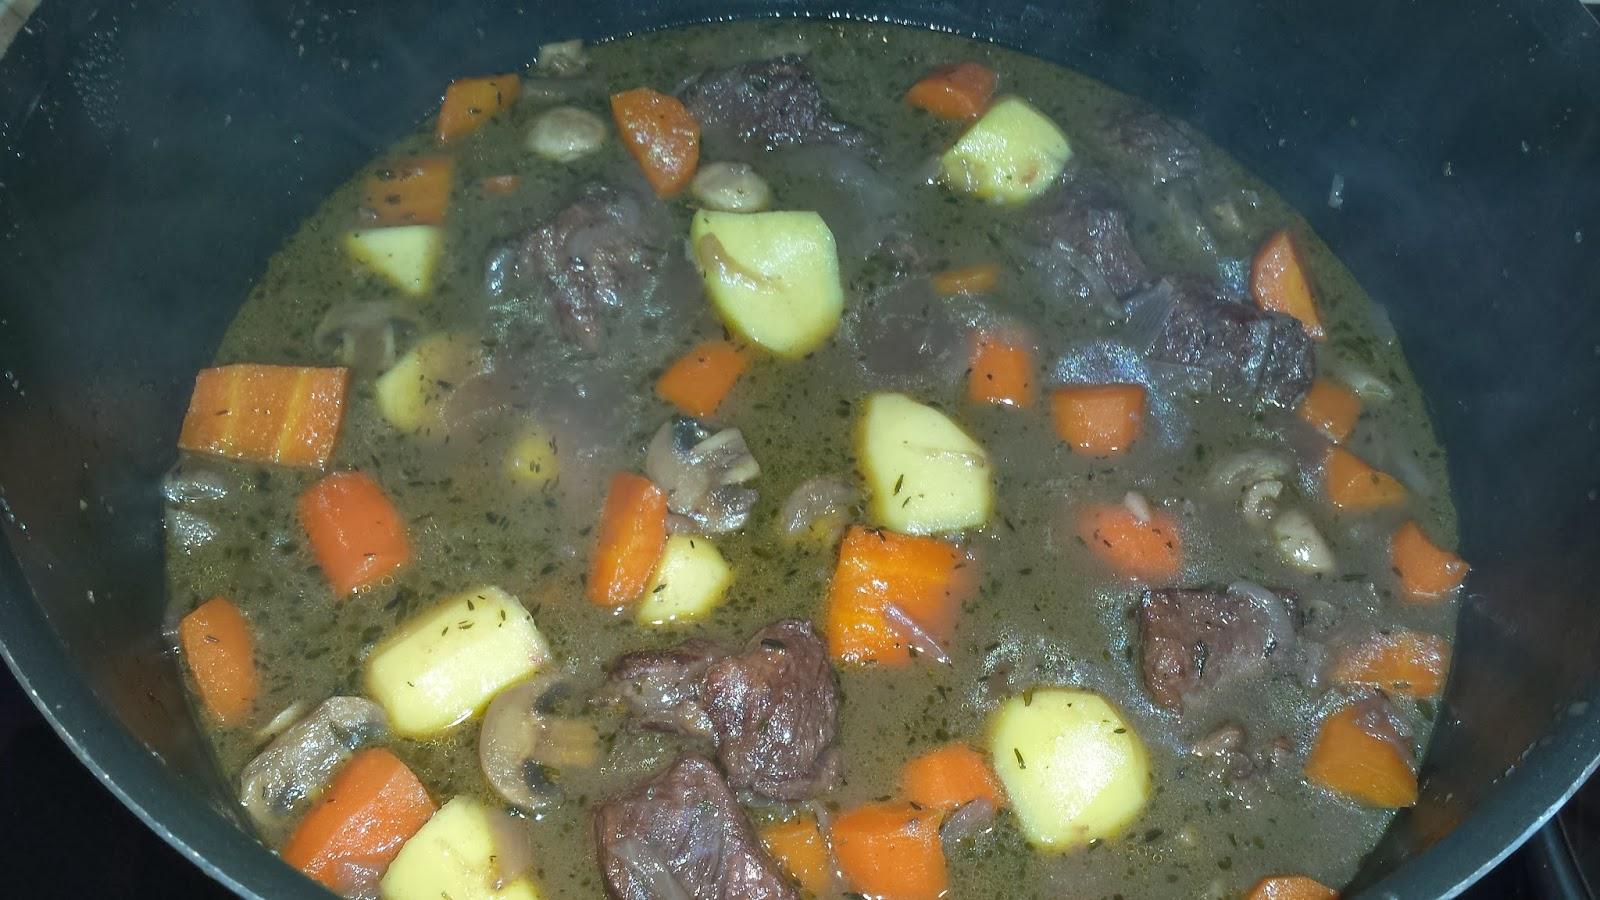 La p 39 tite cuisine de val b uf bourguignon ma fa on - Quel vin pour cuisiner un boeuf bourguignon ...